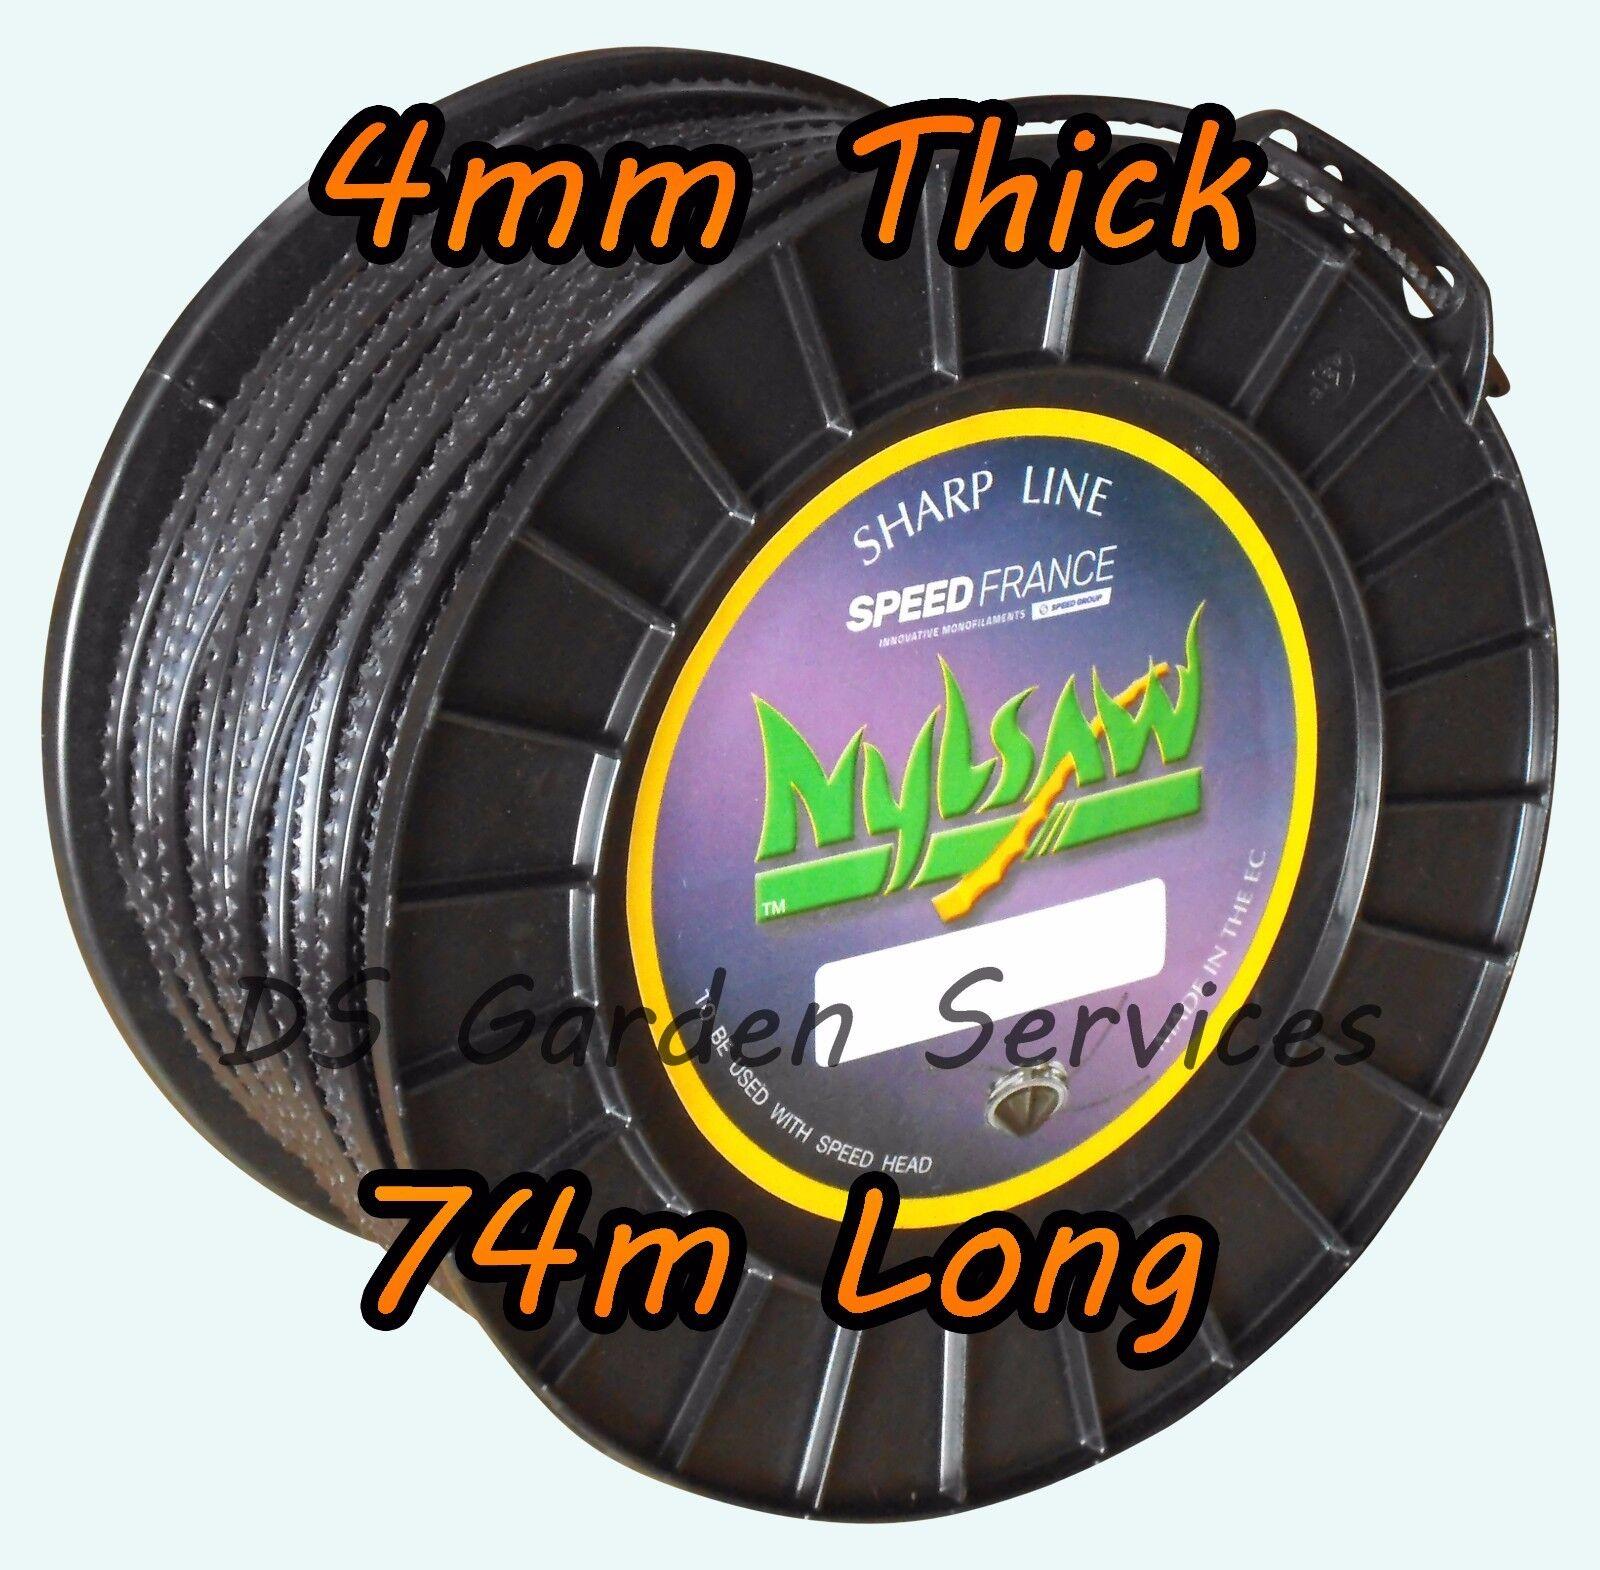 NYLSAW 4 mm x 74 M rossoolo SPIKY linea dentellata Sharp Decespugliatore Trimmer Wire Cord